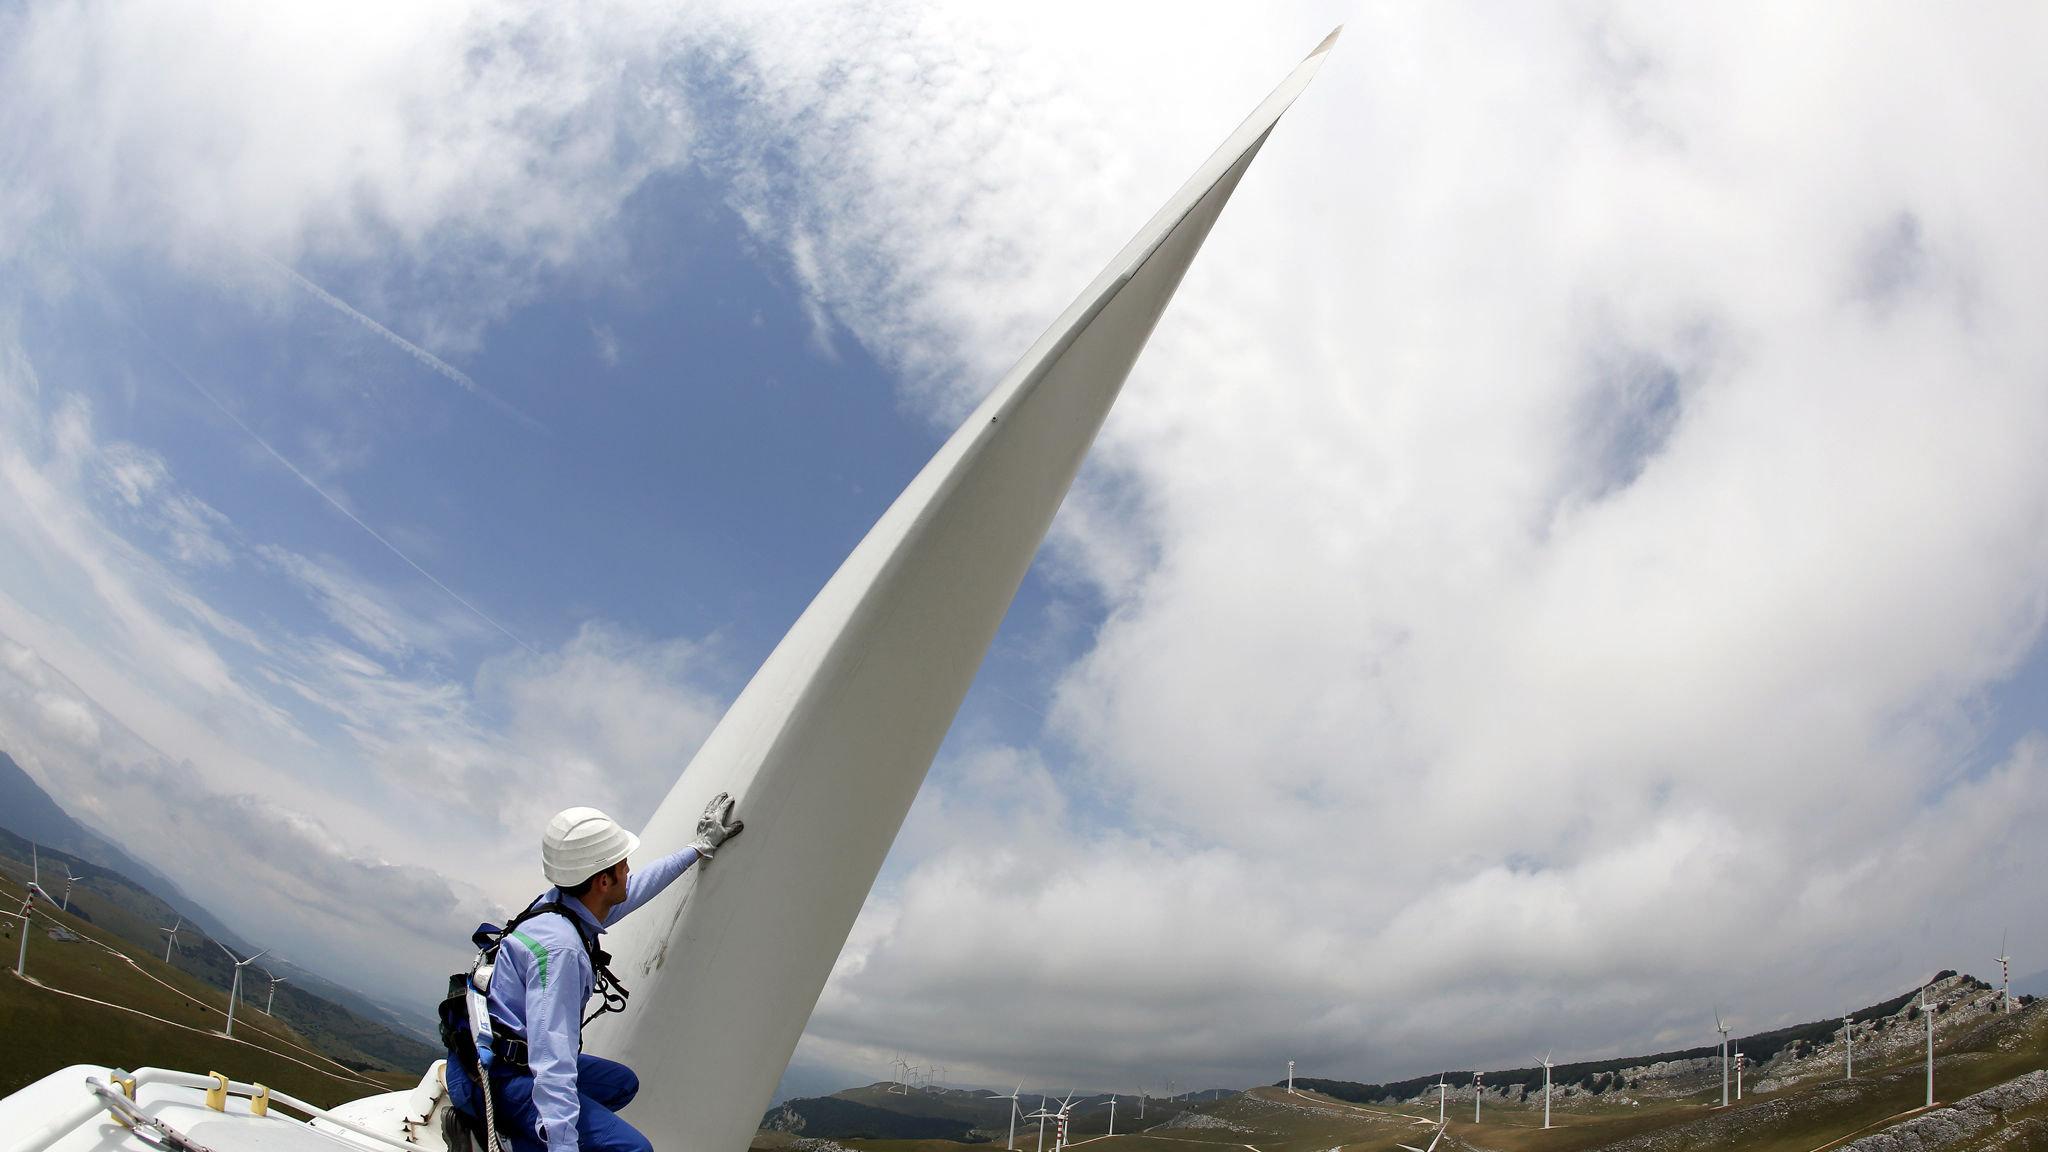 Balsa shortage threatens wind power rollout